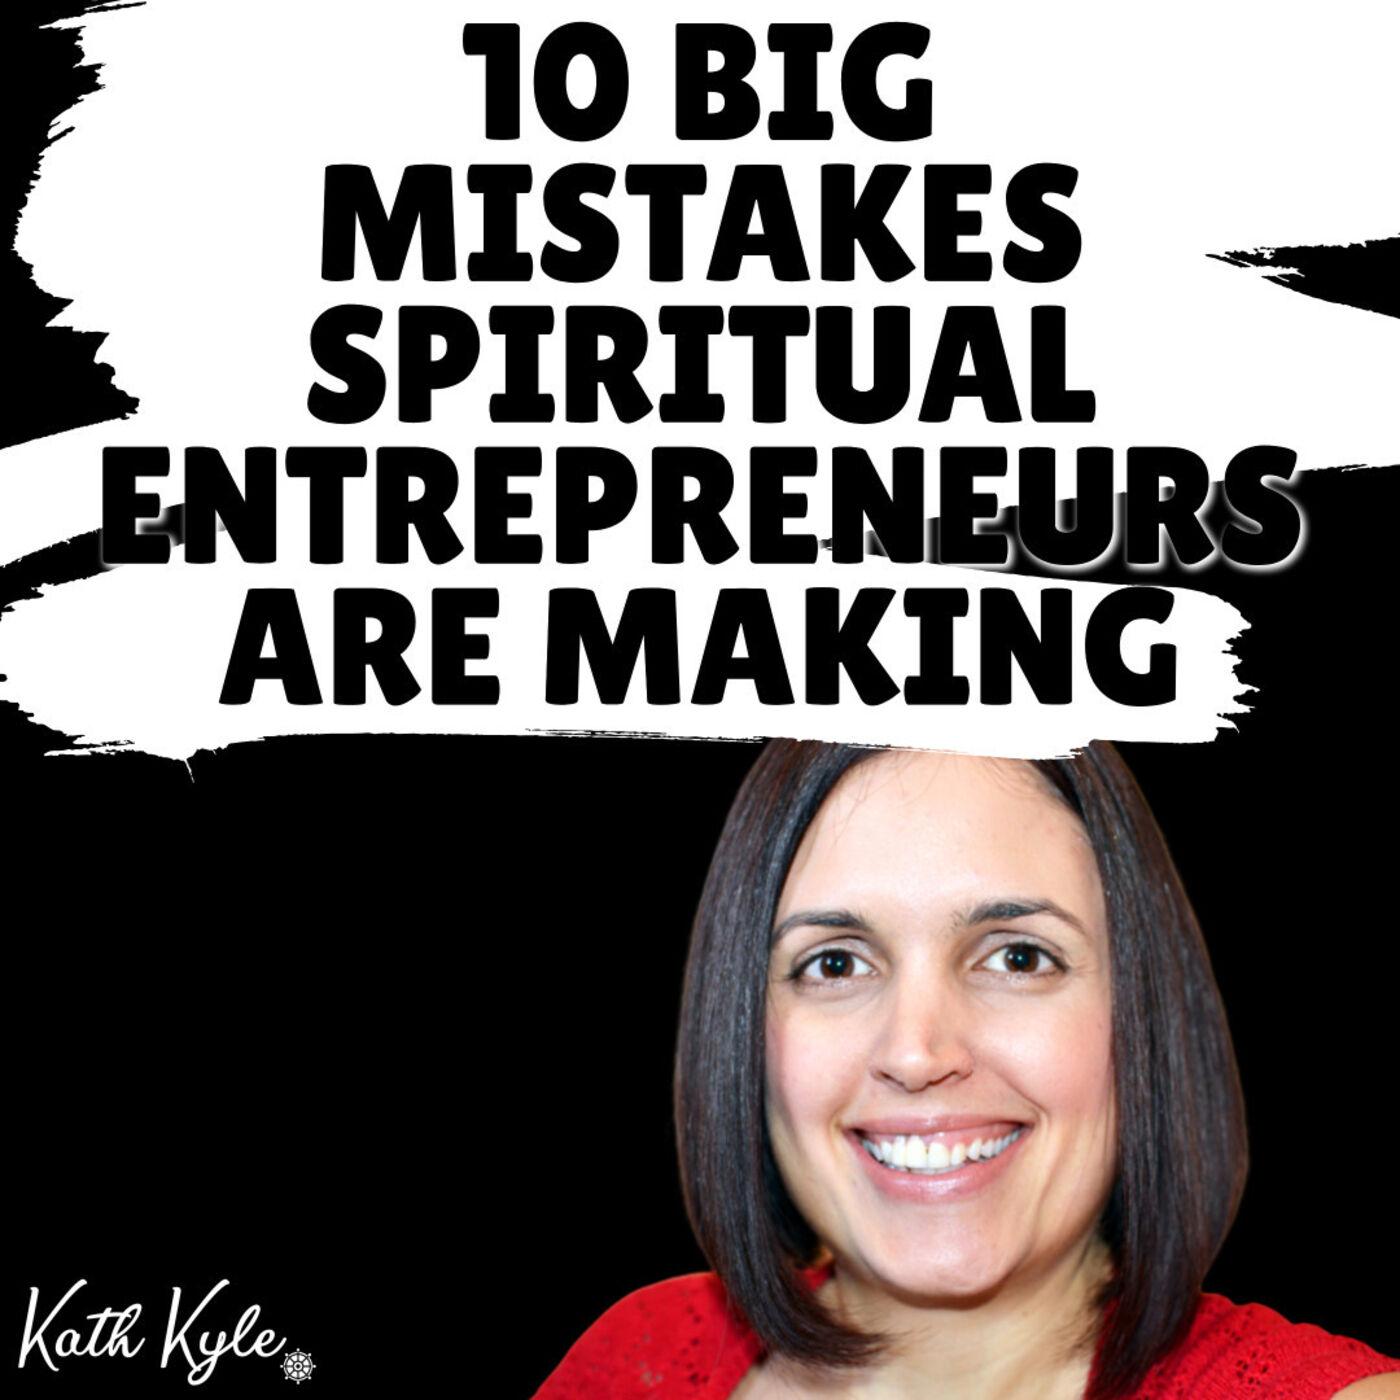 10 BIG Mistakes Spiritual Entrepreneurs Are Making